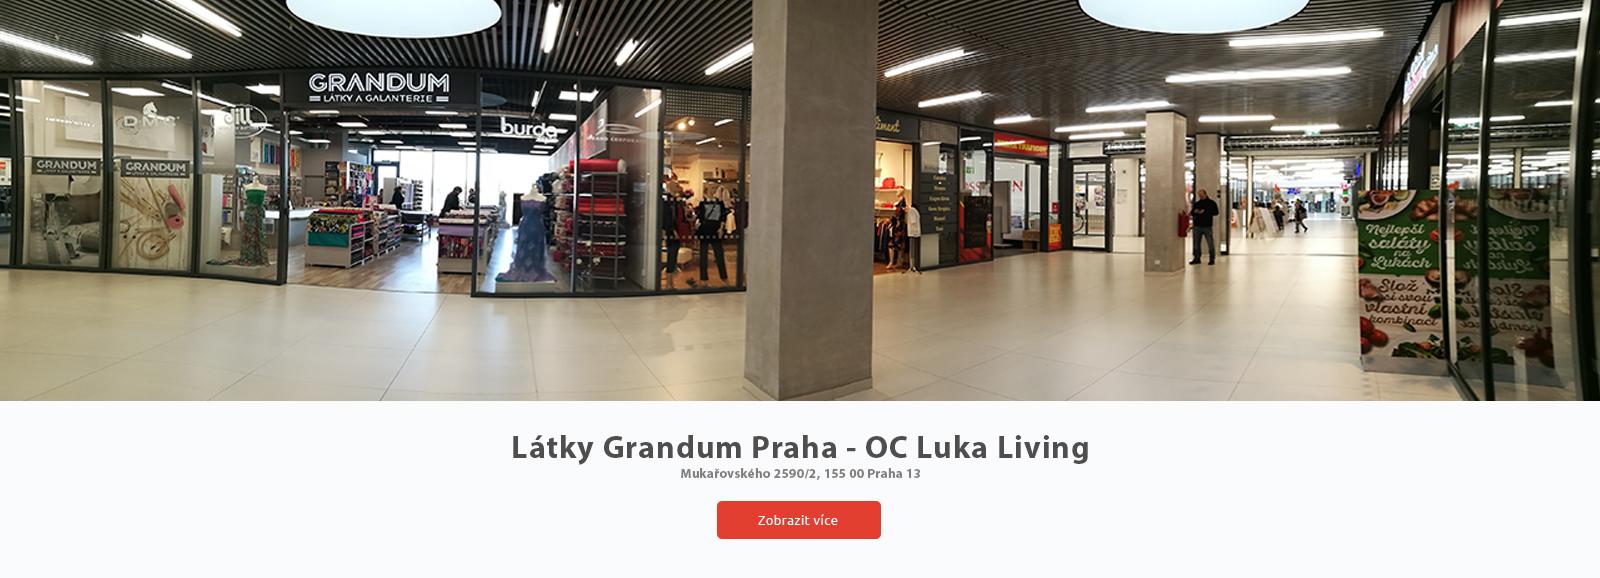 Látky Praha | Látky Grandum Praha 13 Luka